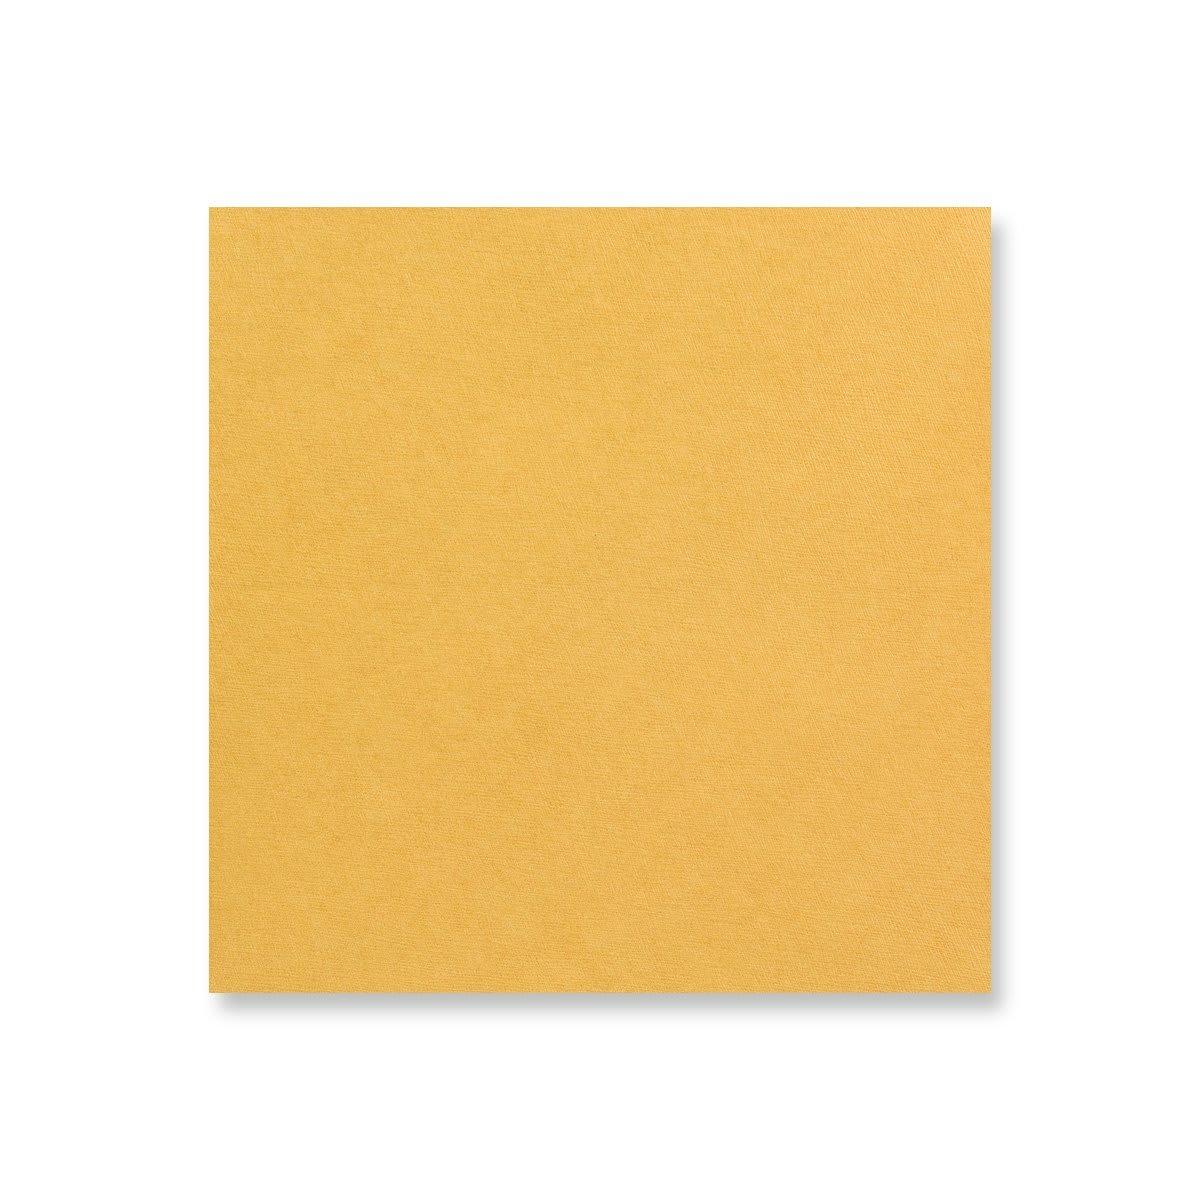 145 x 145mm GOLD POUCHETTES